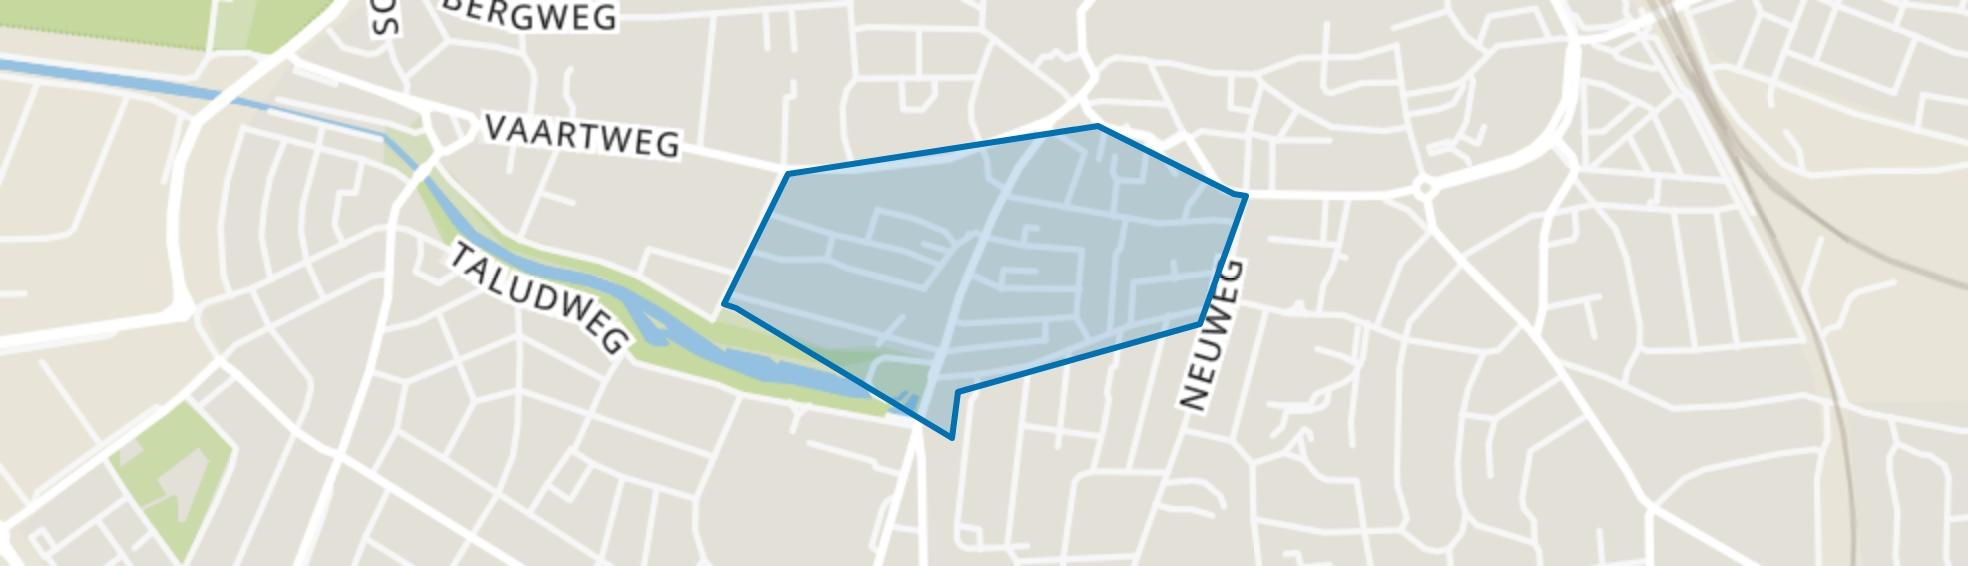 Havenstraatbuurt, Hilversum map